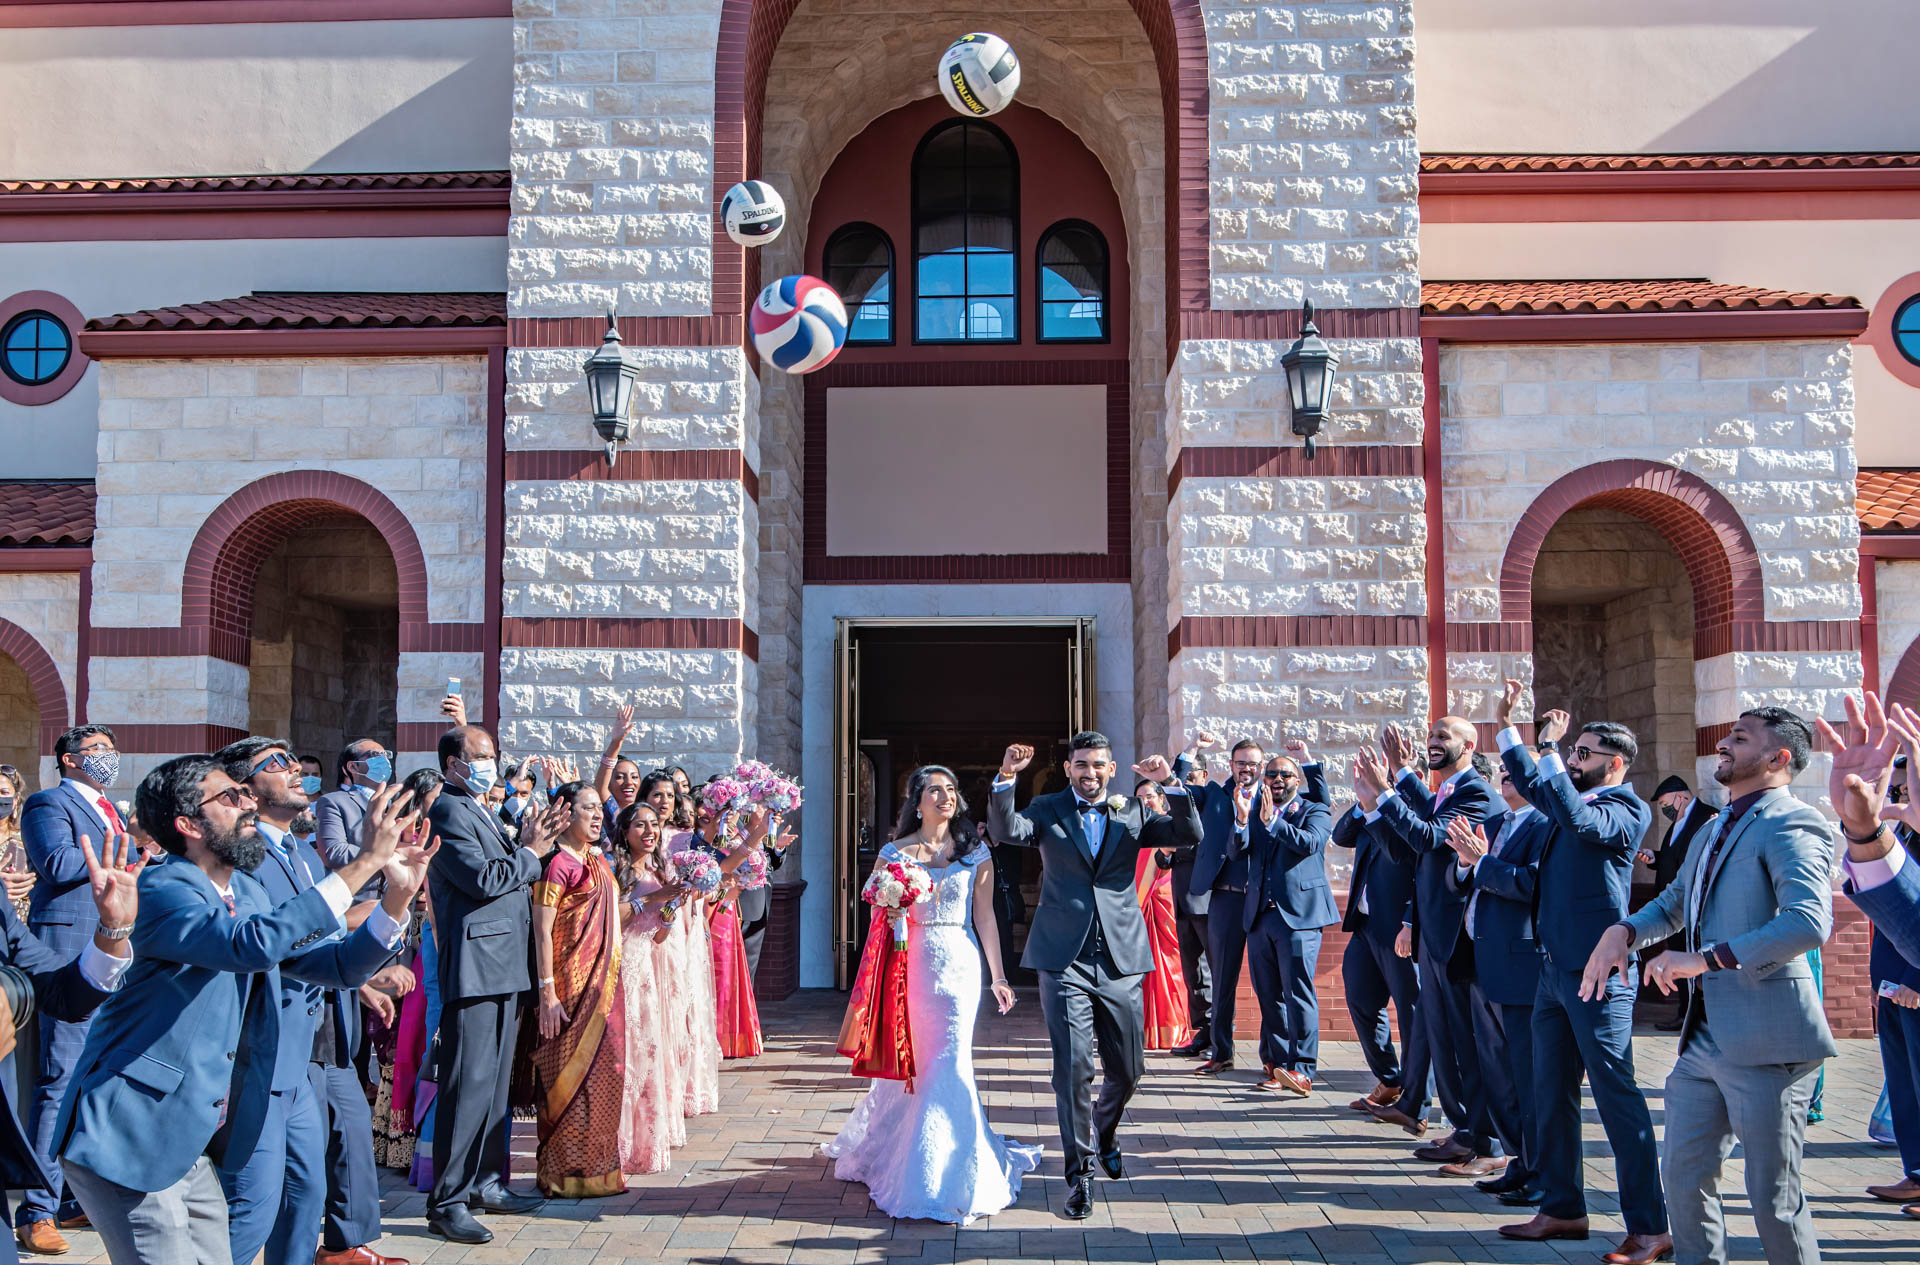 WESTMOUNT COUNTRY CLUB INDIAN WEDDING 20